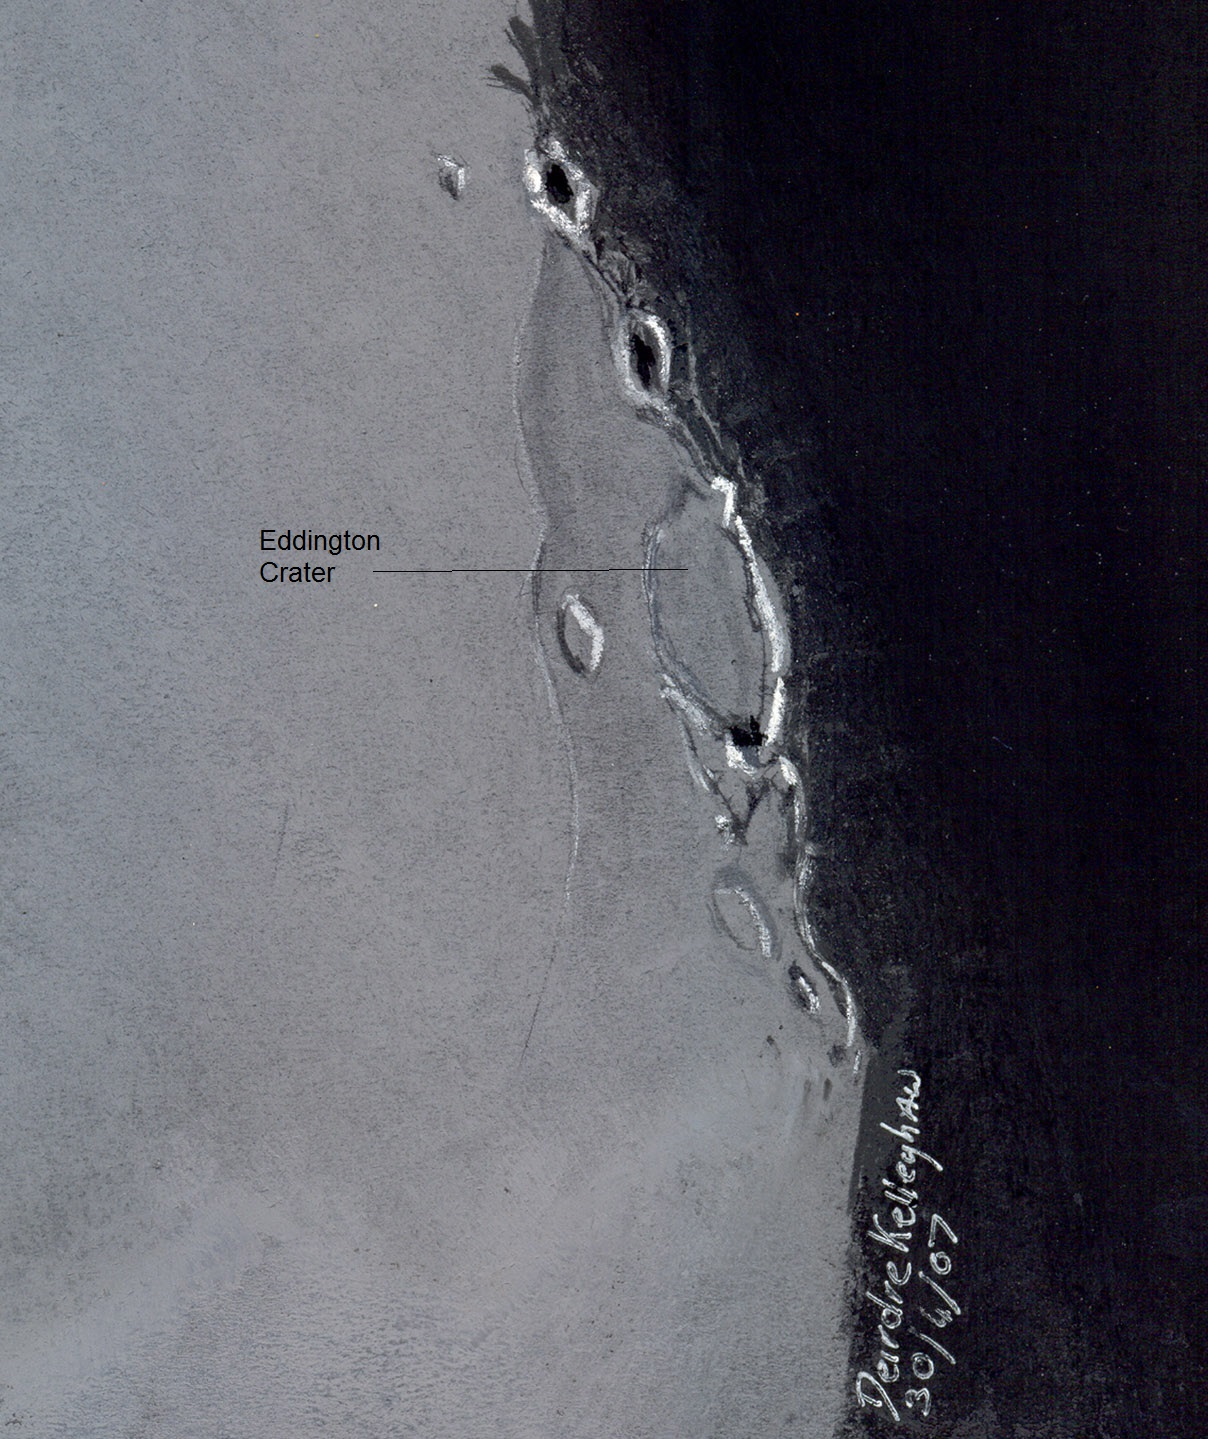 Eddington Crater